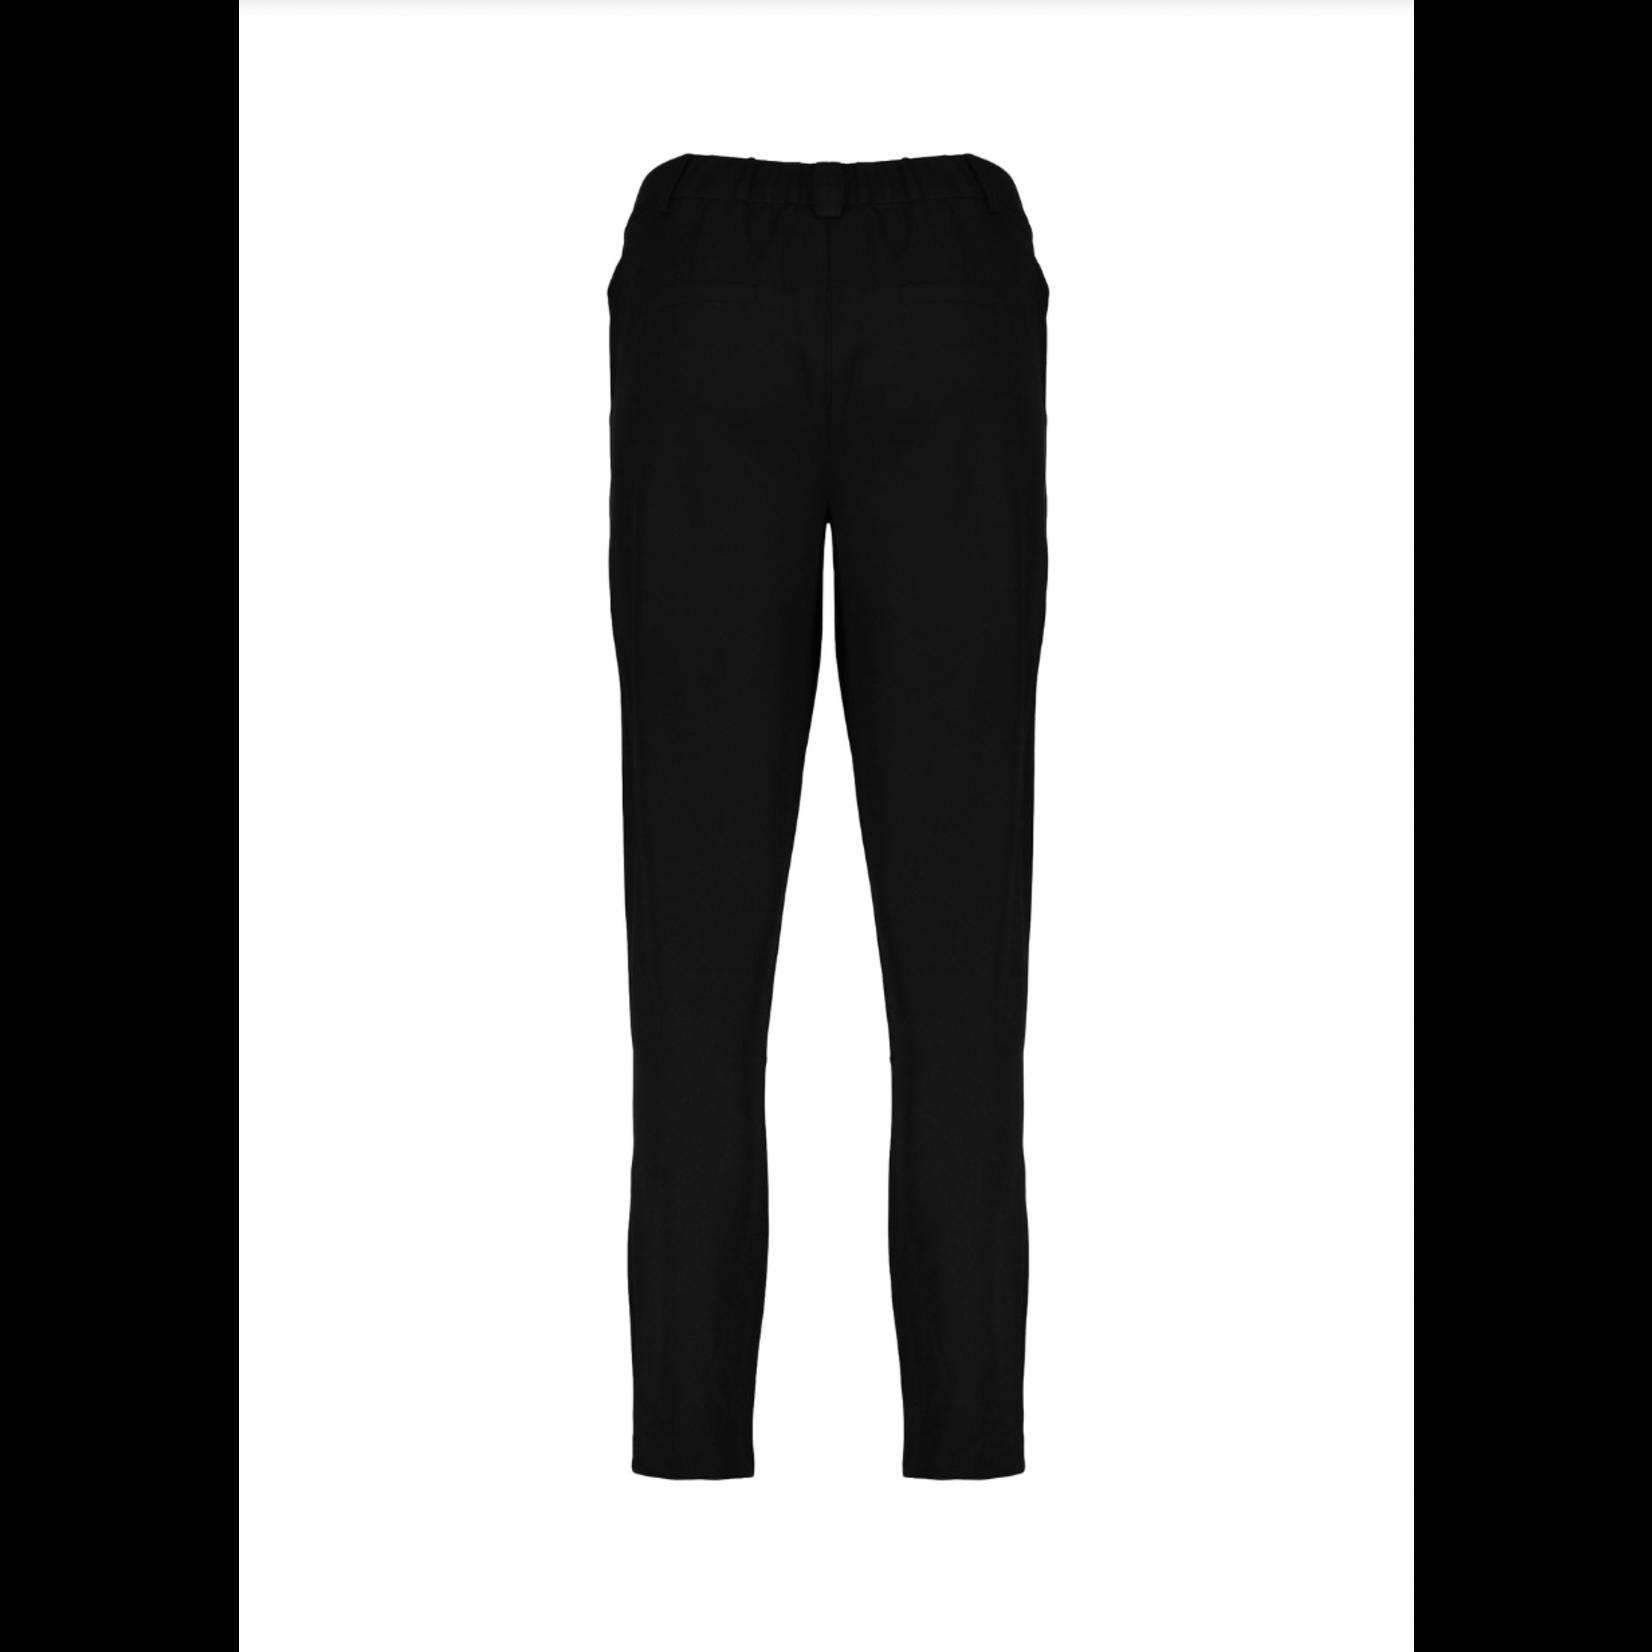 Geisha Geisha Pants Black 11509-10